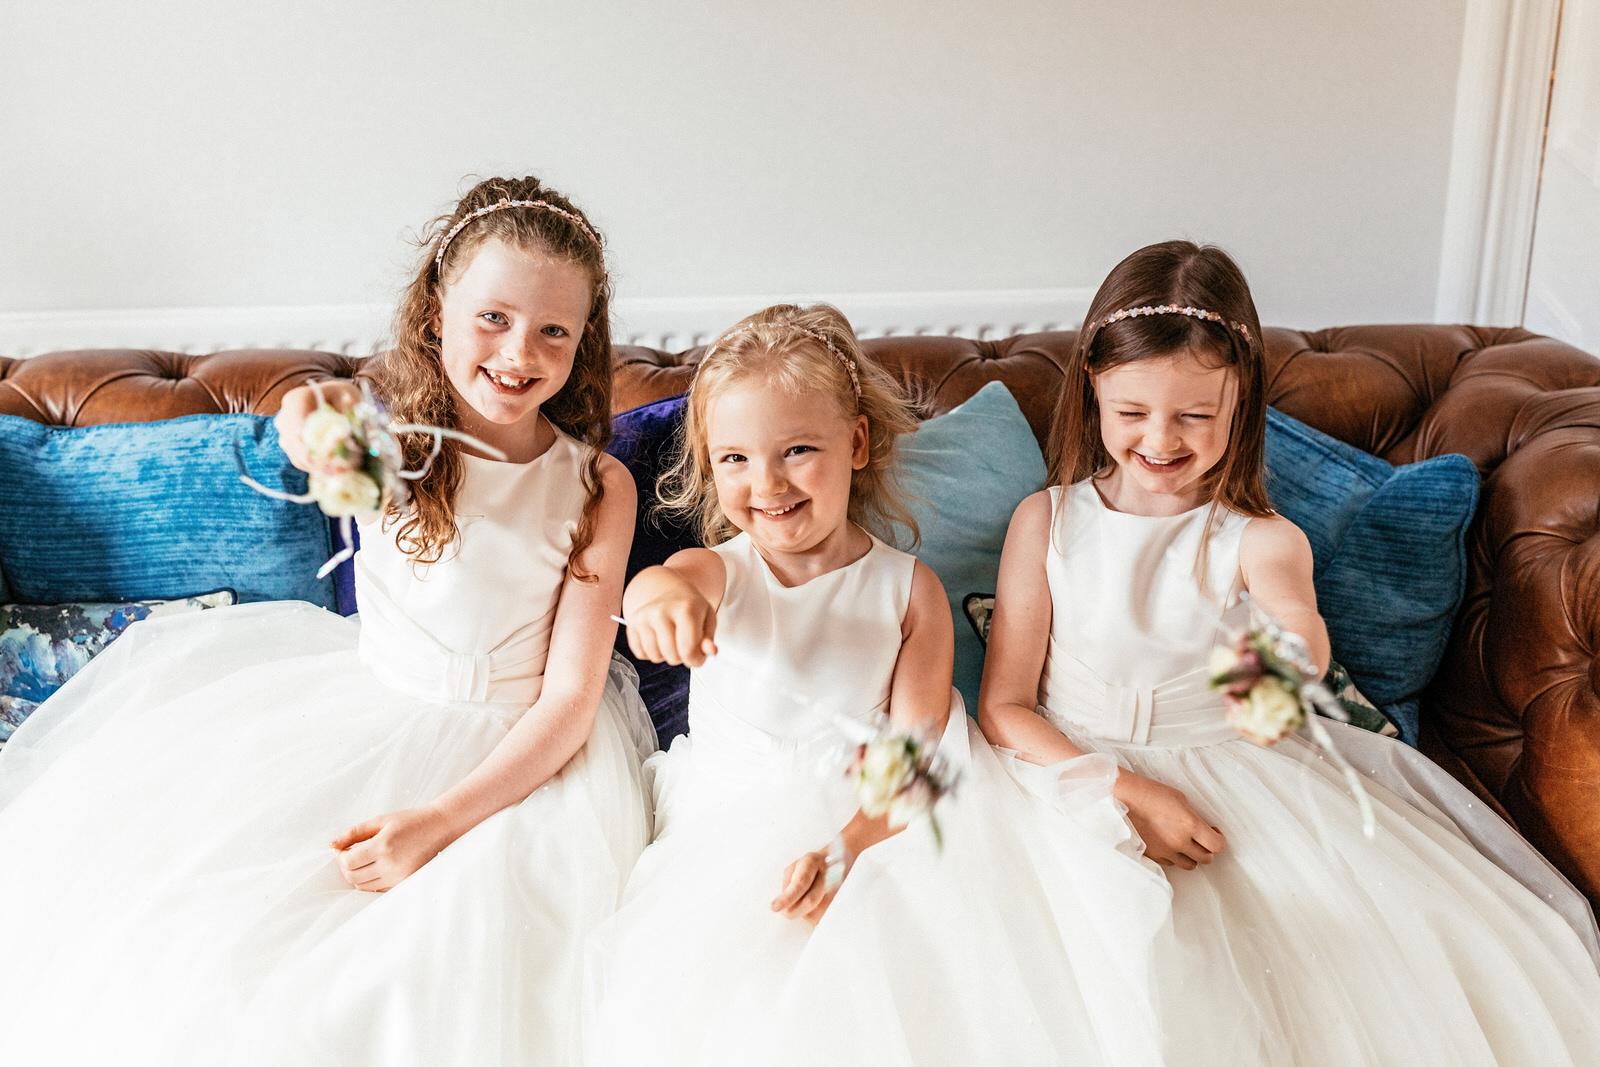 Beamish-Hall-Wedding-Photographer-003.jpg